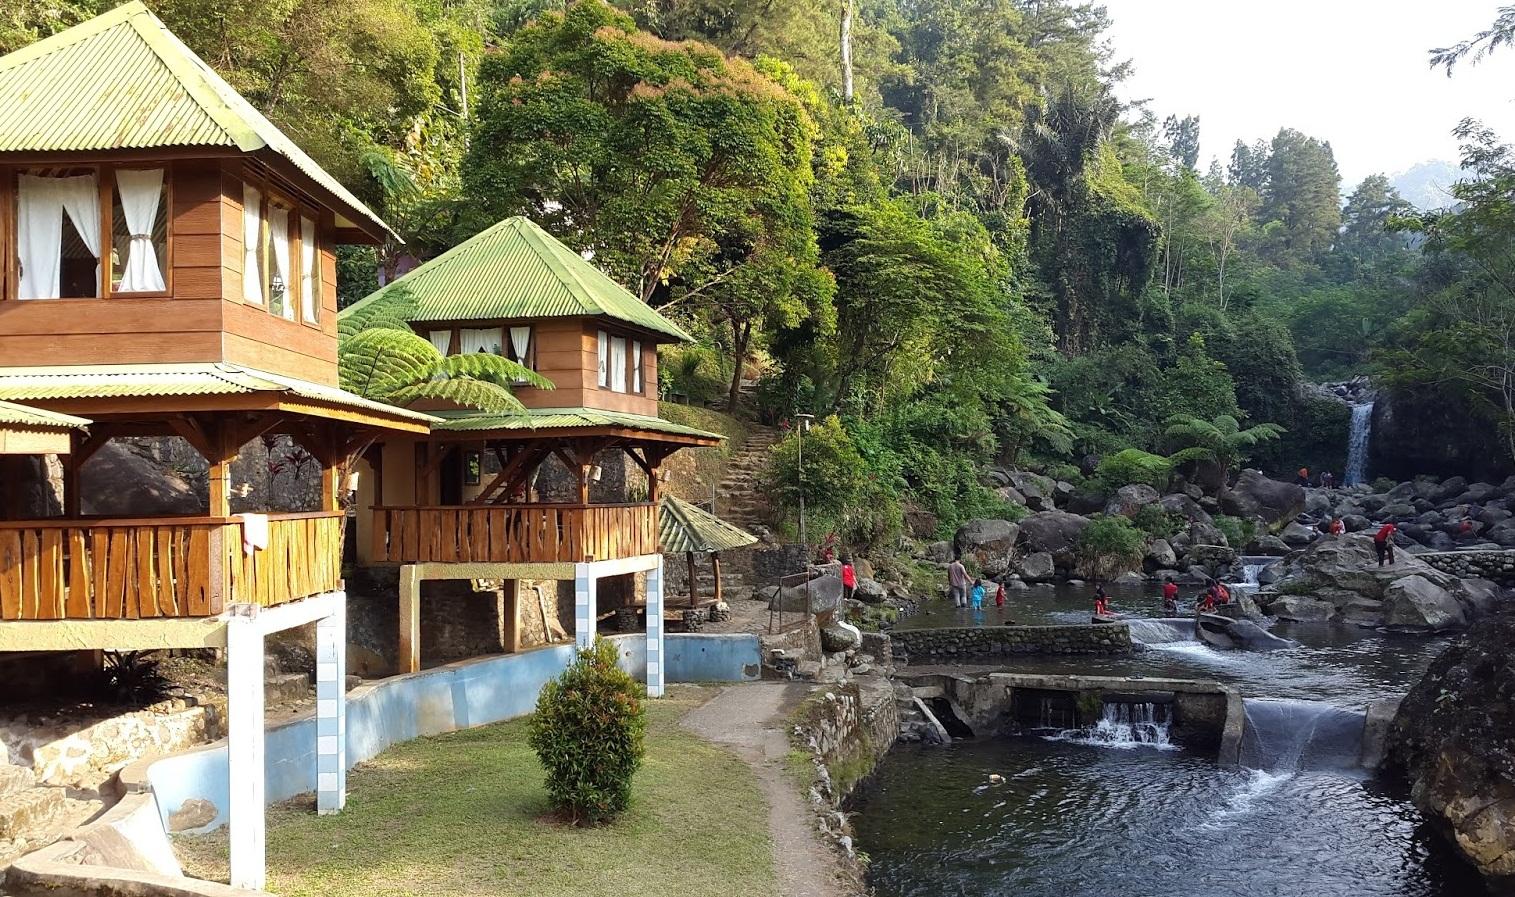 Wisata Curug Gede Desa Ketenger Baturaden Banyumas Kab